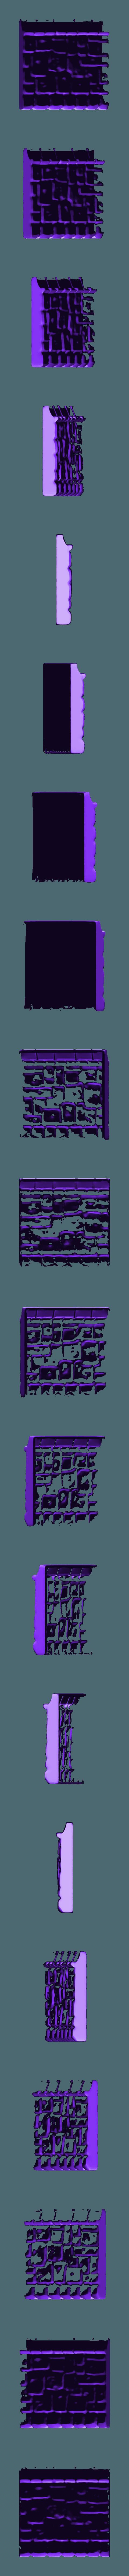 street_drain.stl Download free STL file Fantasy city set • 3D printable model, HeribertoValle